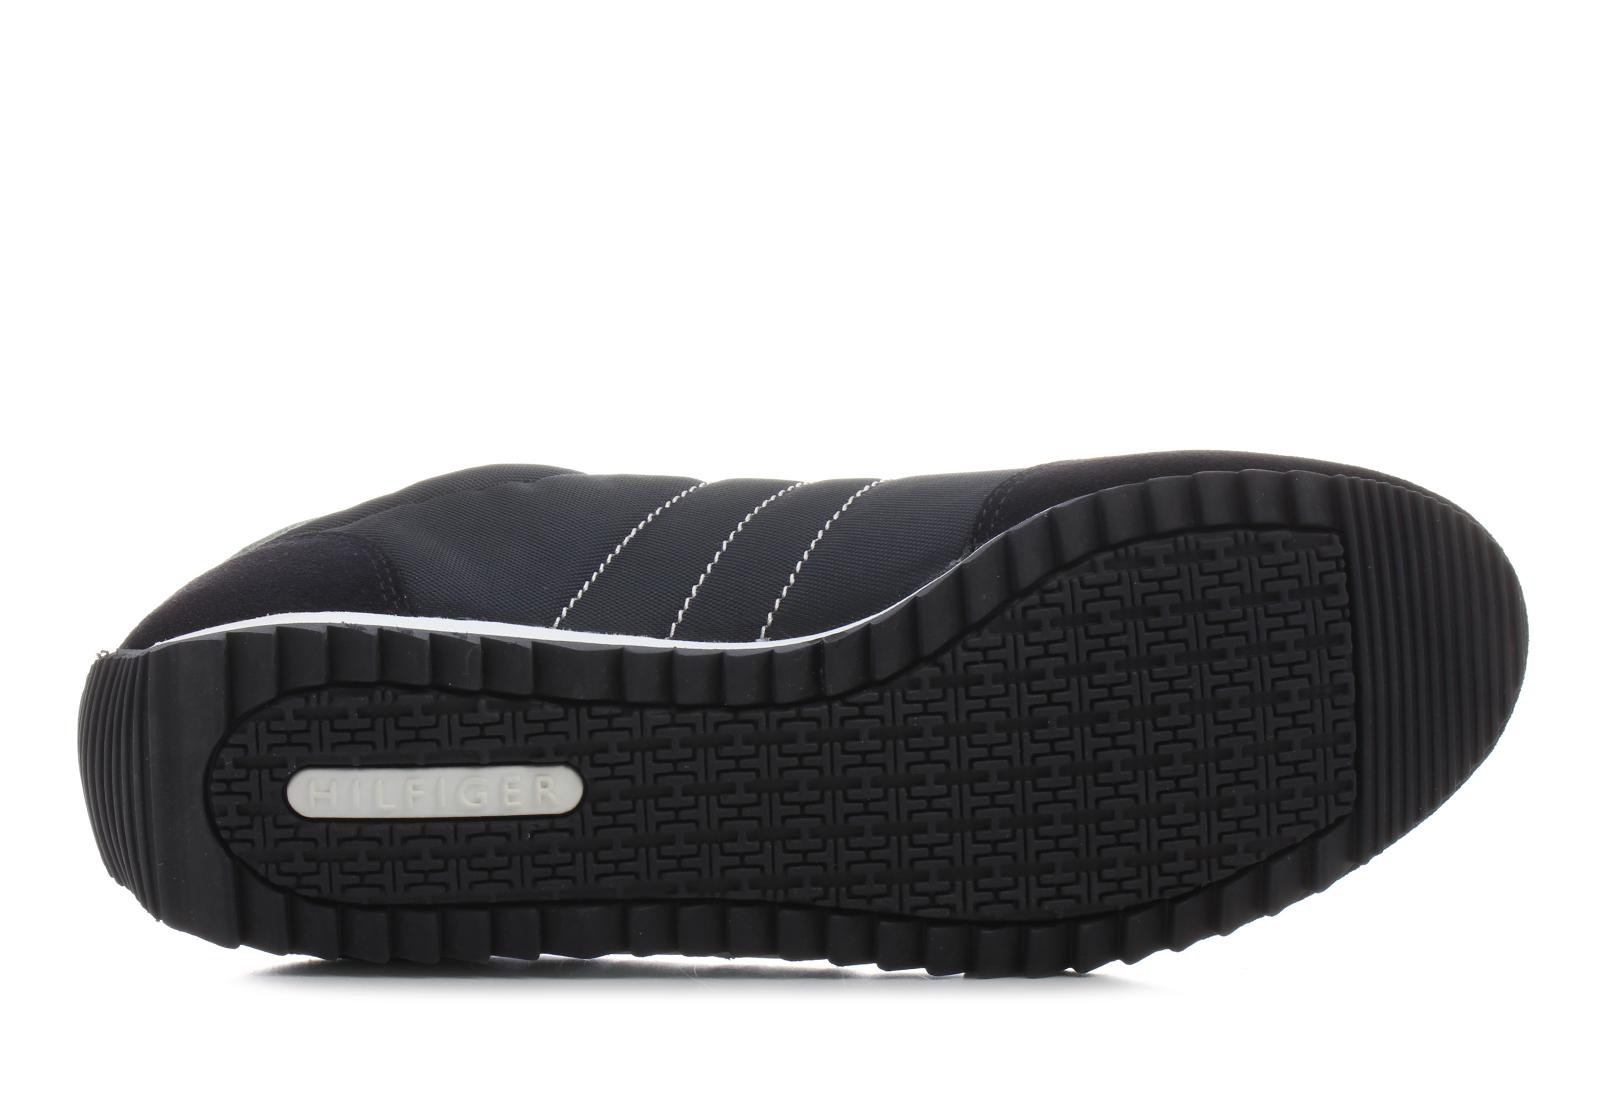 8eb849b9275d2 Tommy Hilfiger Shoes - Branson 5 - 18S-1032-424 - Online shop for ...